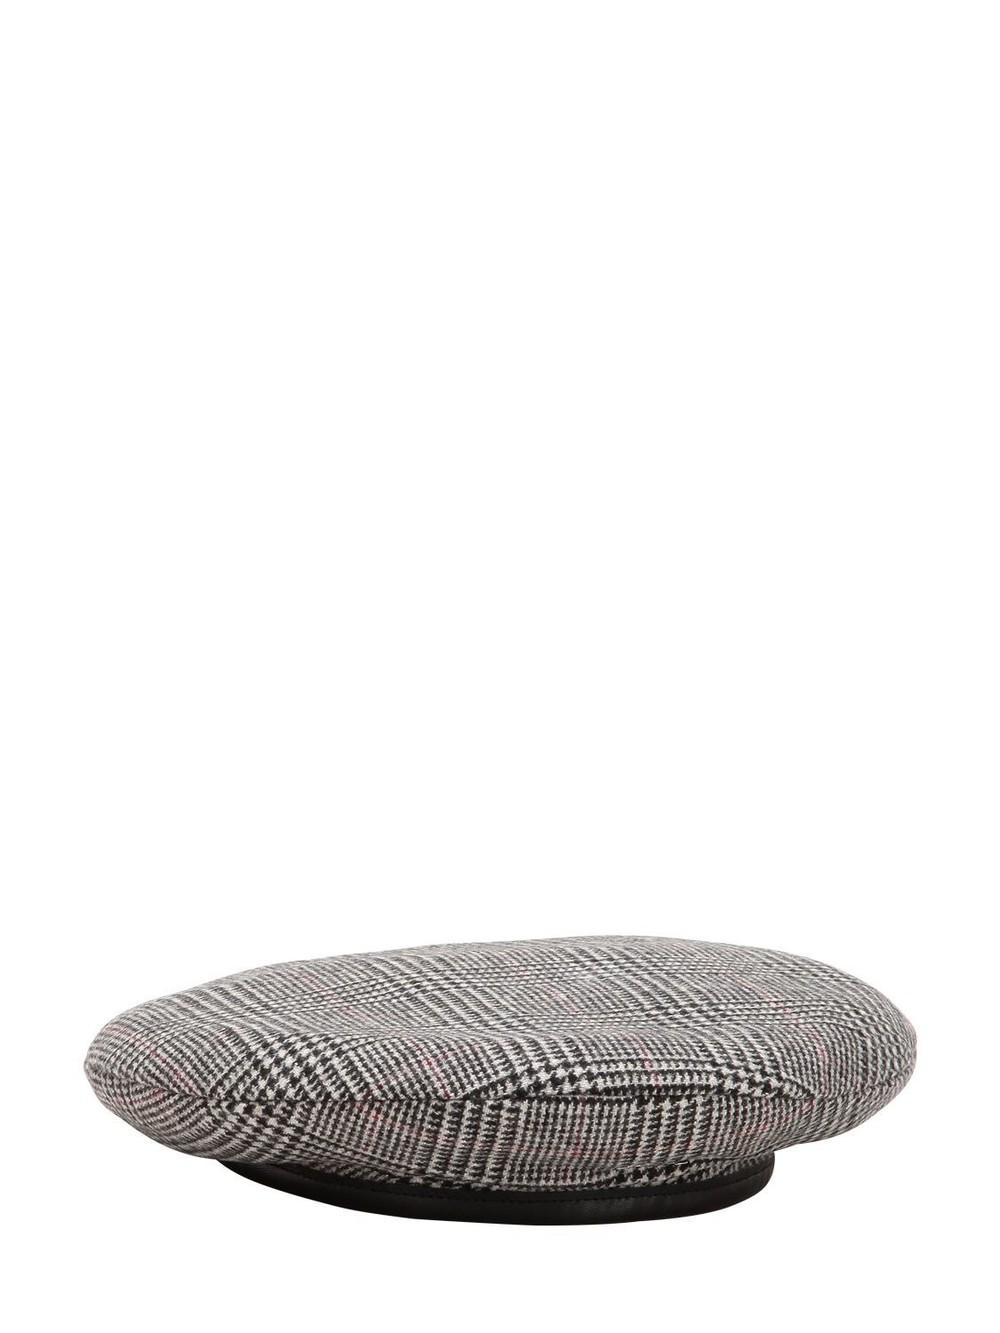 DON Plaid Merino Wool Beret in grey